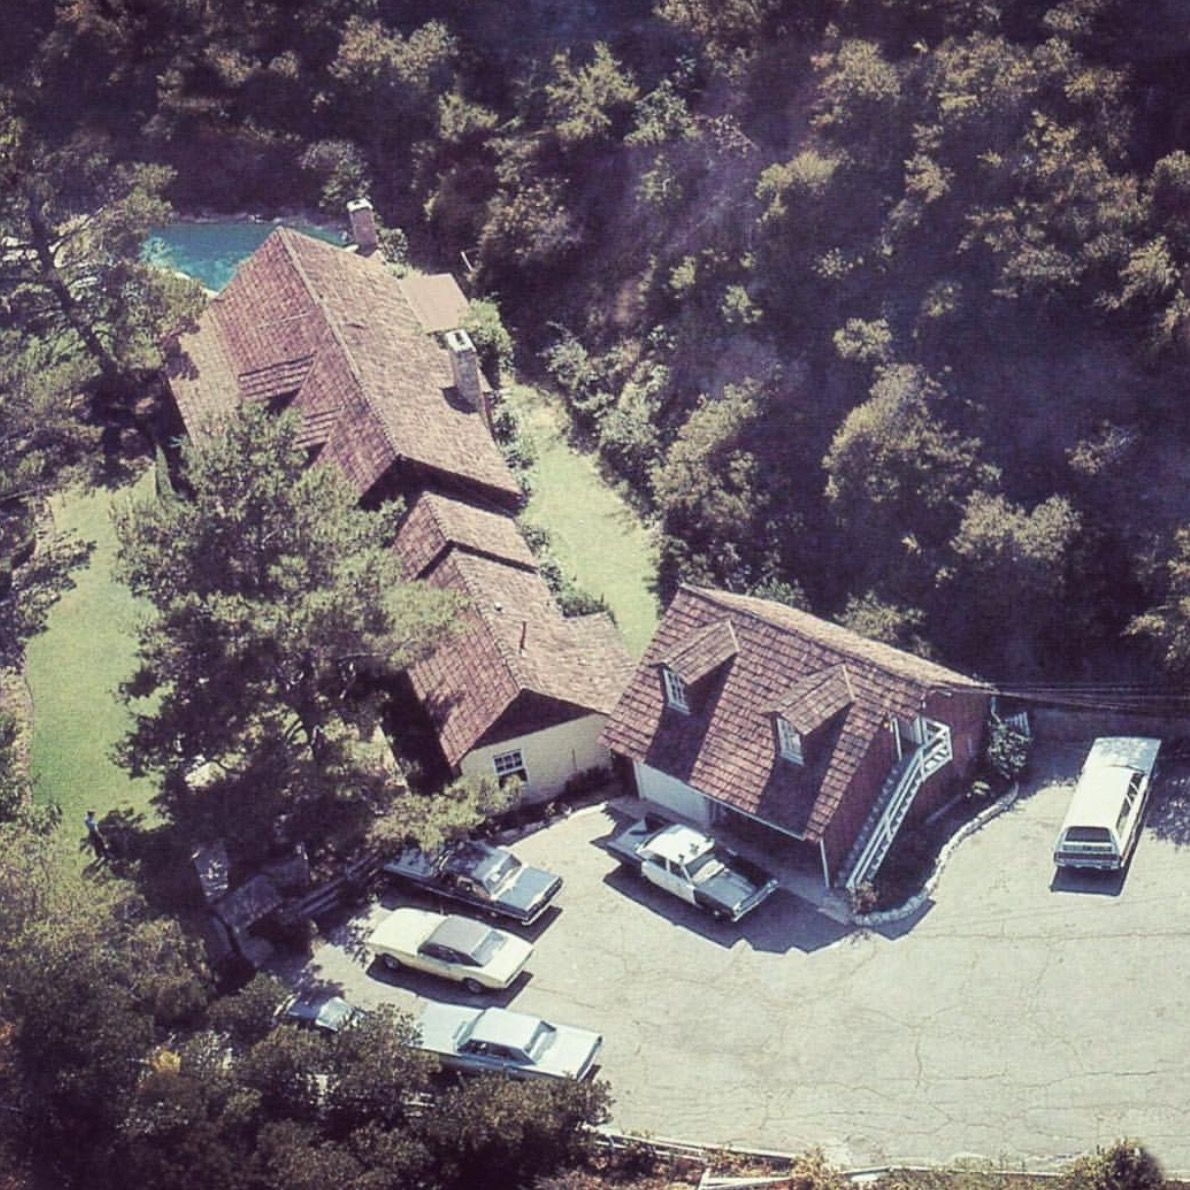 10050 Cielo Drive   Helter Skelter in 2019   Sharon tate crime scene